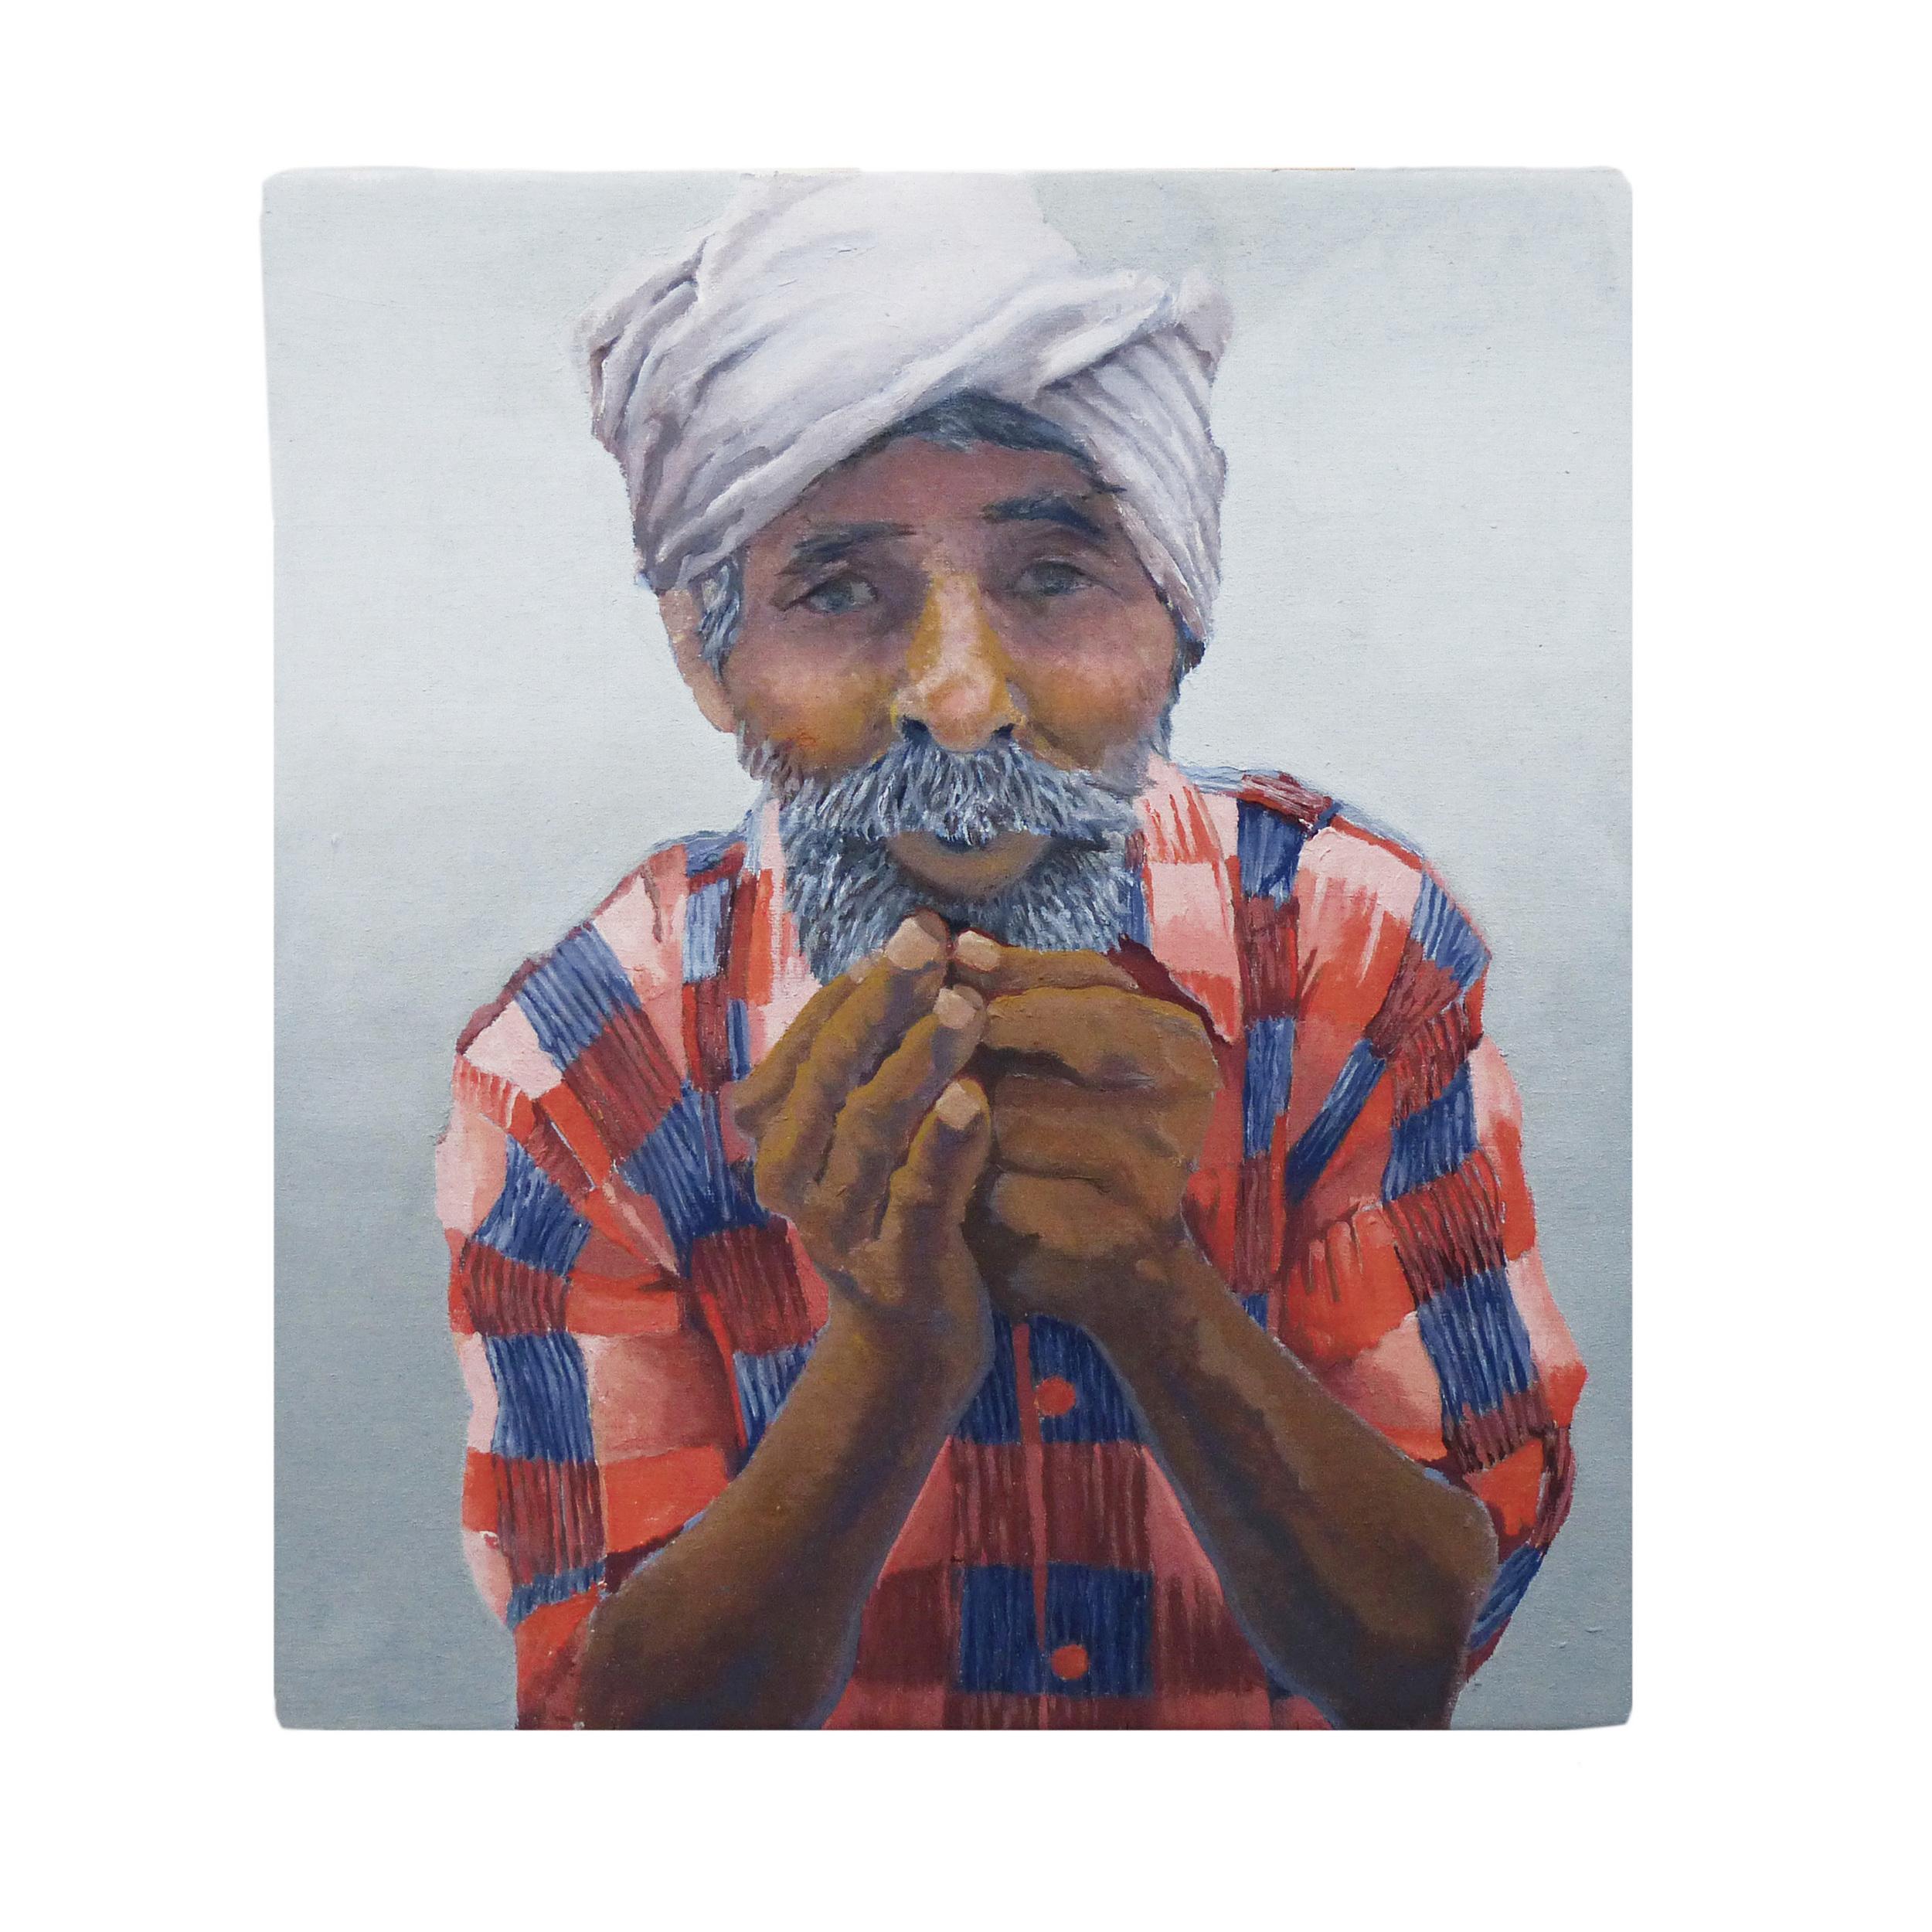 Supplicant: India, 2013